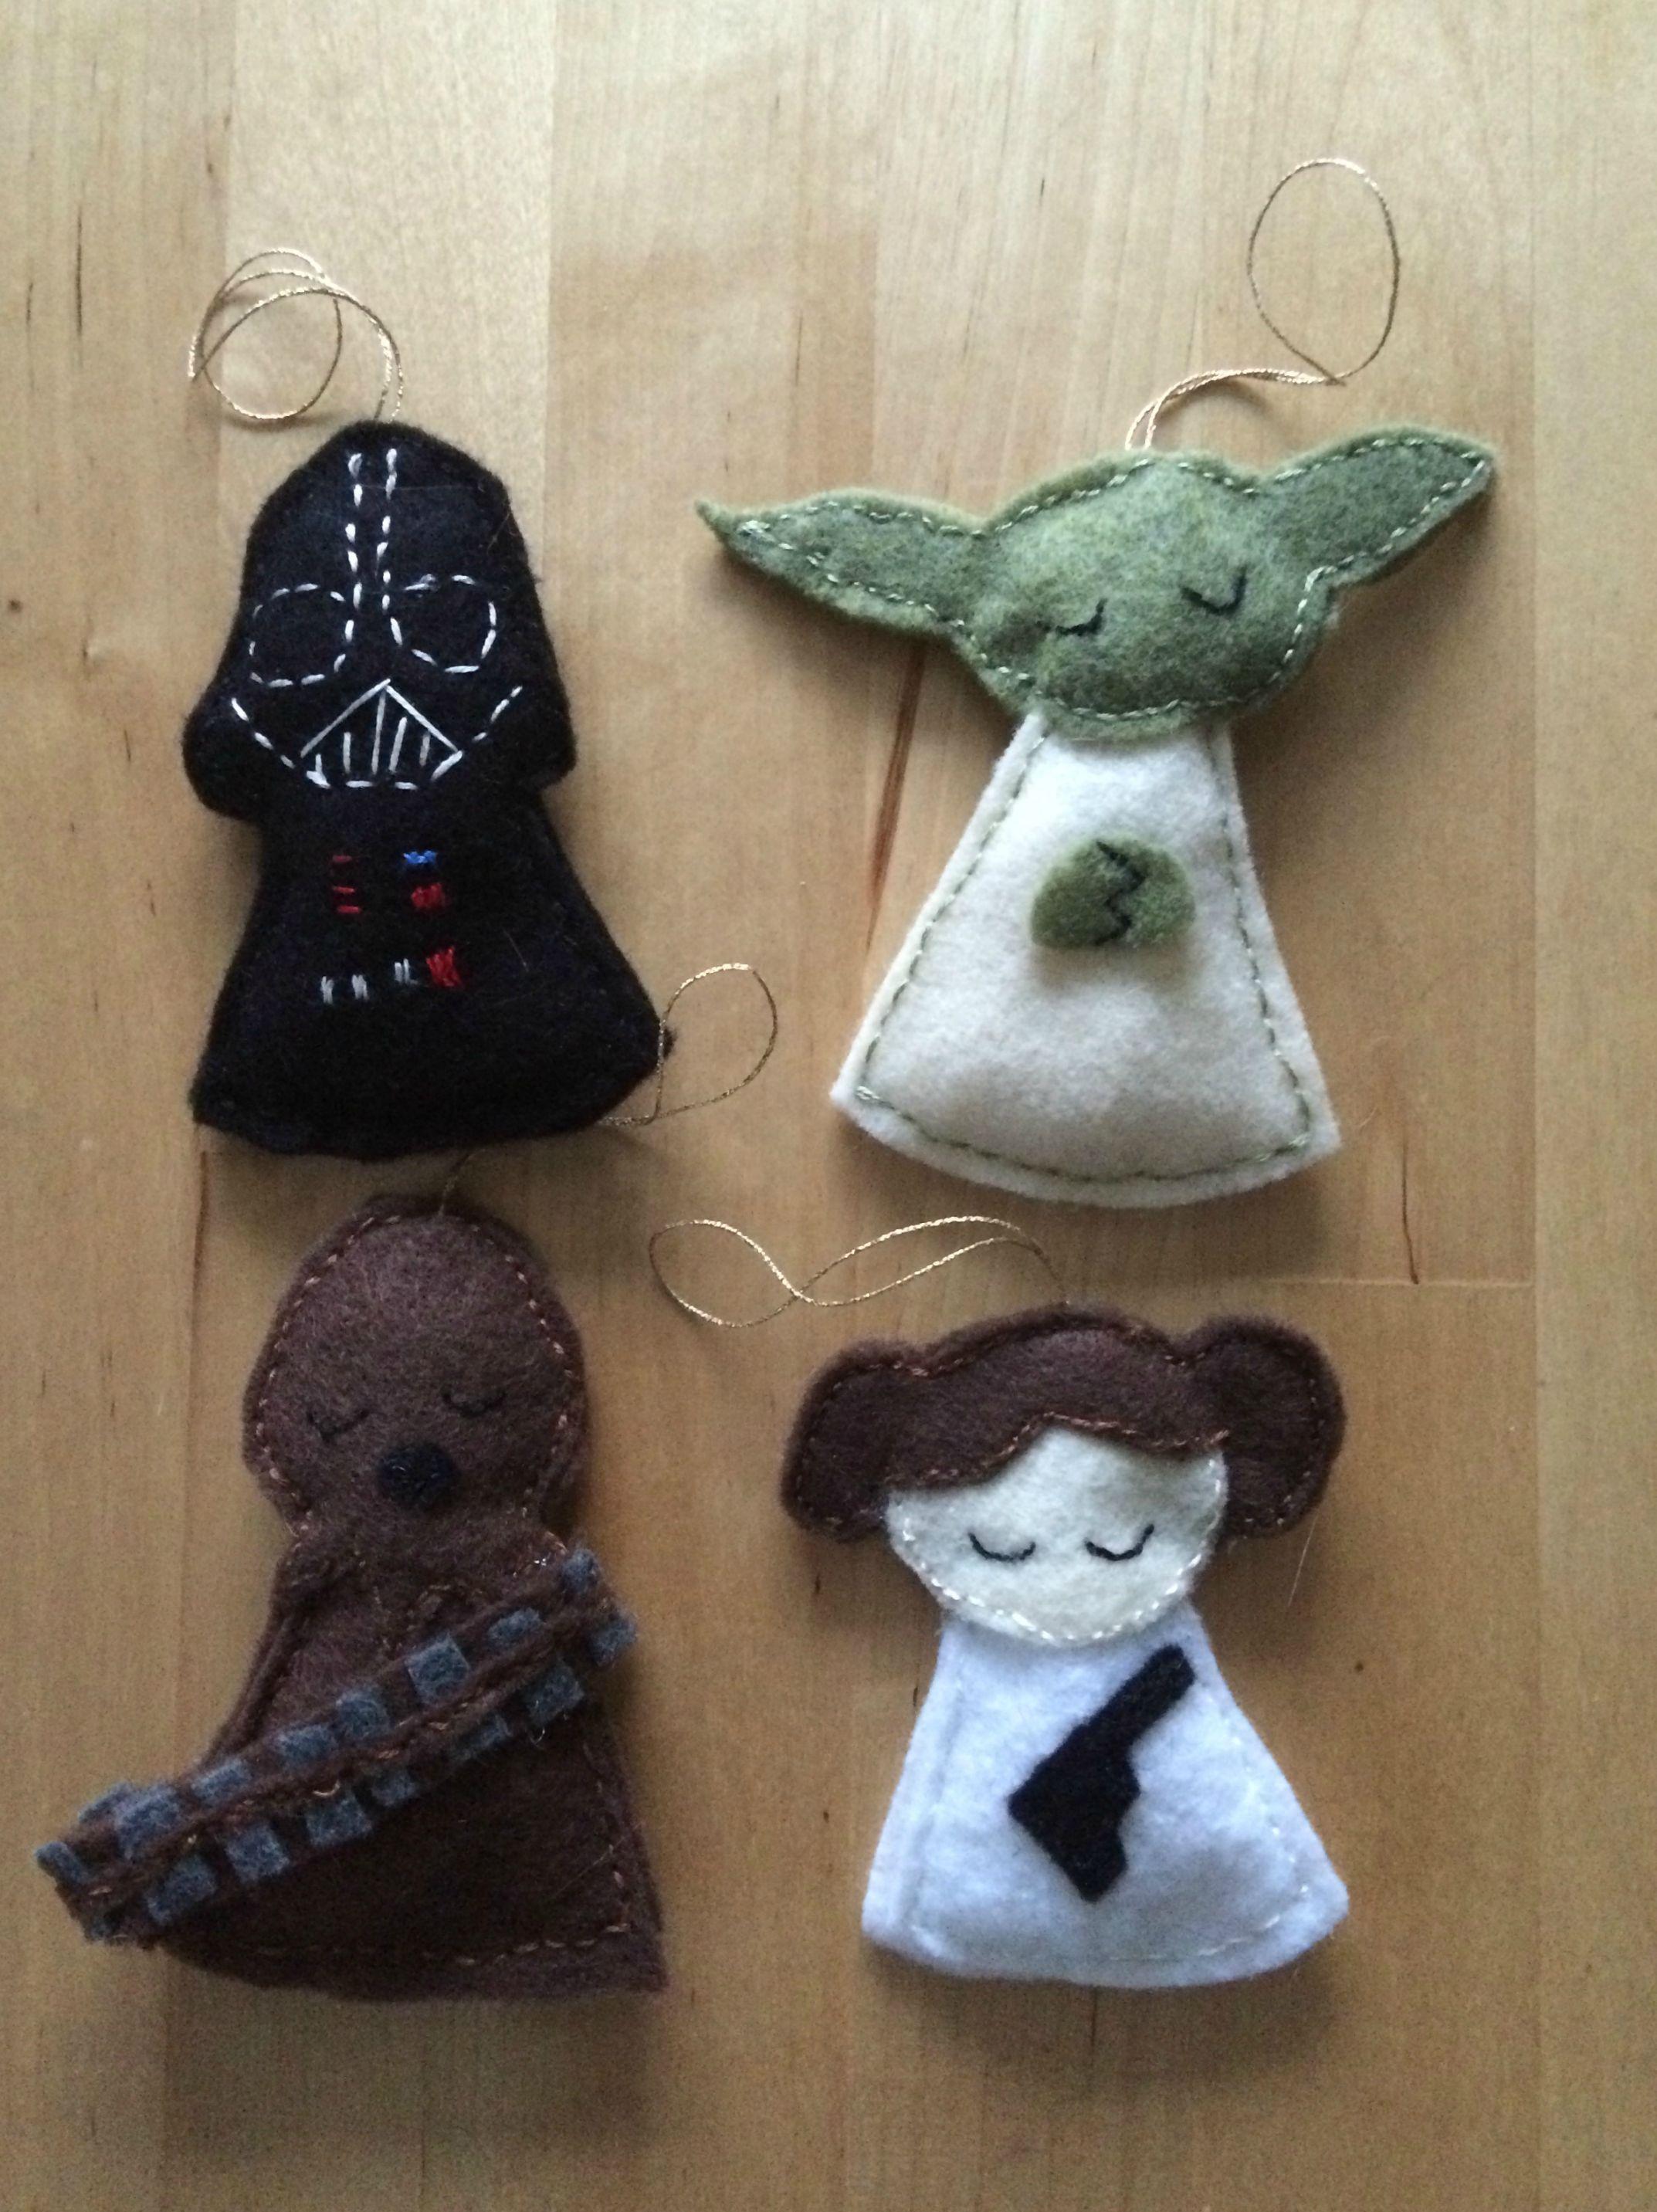 Felt Star Wars Ornaments Felt Ornaments Patterns Diy Christmas Star Star Wars Crafts